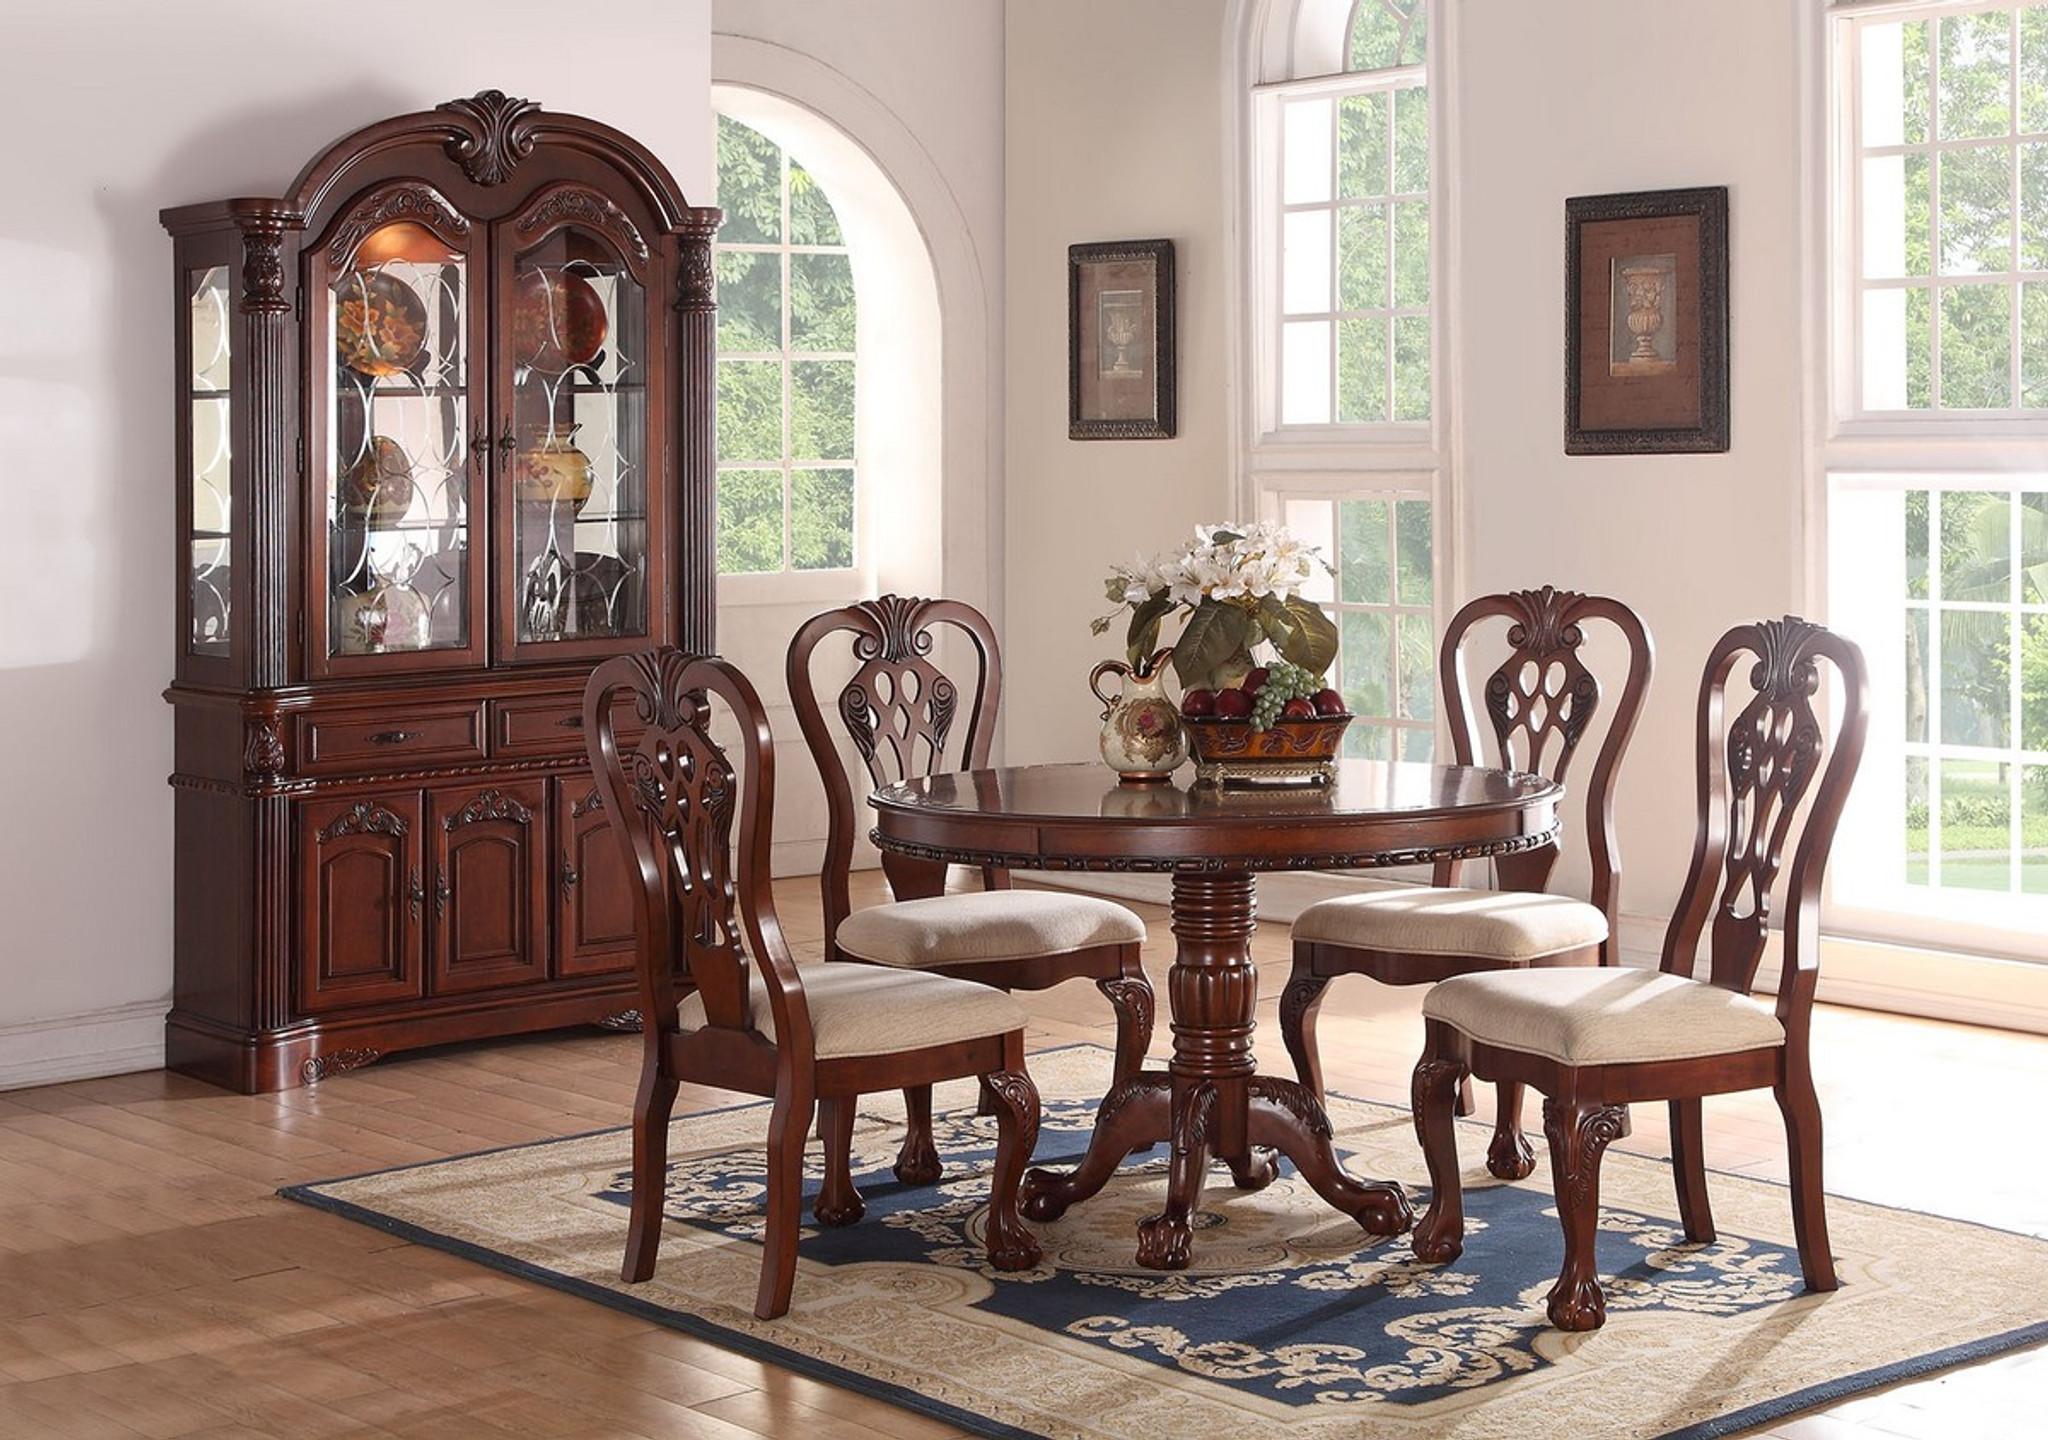 Kassa Mall Home Furniture F2156 F1487 F6057 5pcs Round Dining Table Set In Dark Cherry Wood Finish